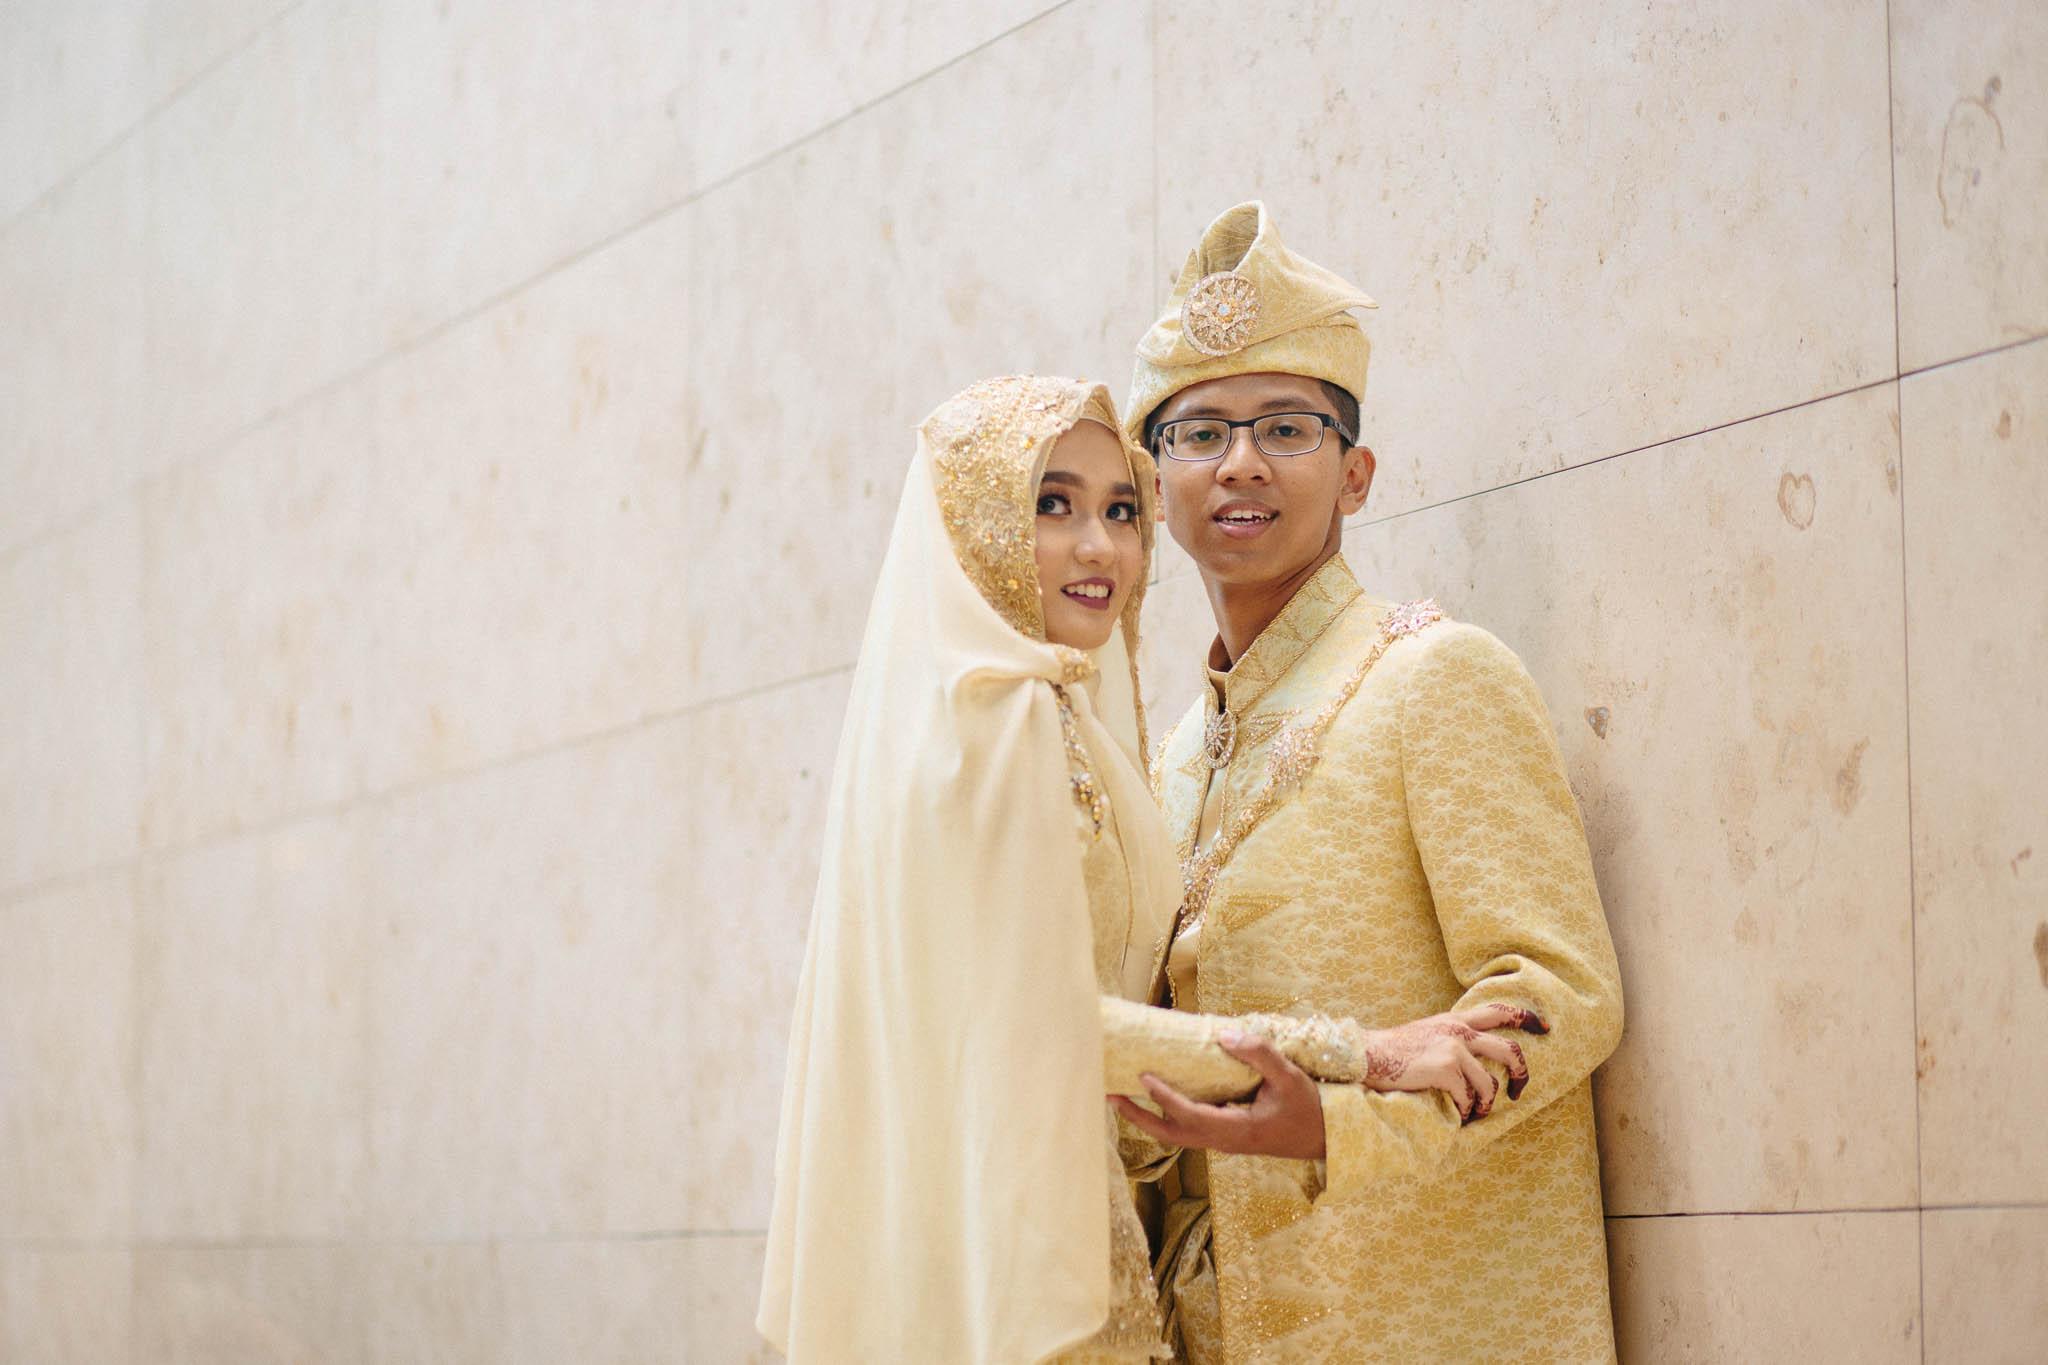 singapore-wedding-photographer-sharalyn-syazwan-040.jpg